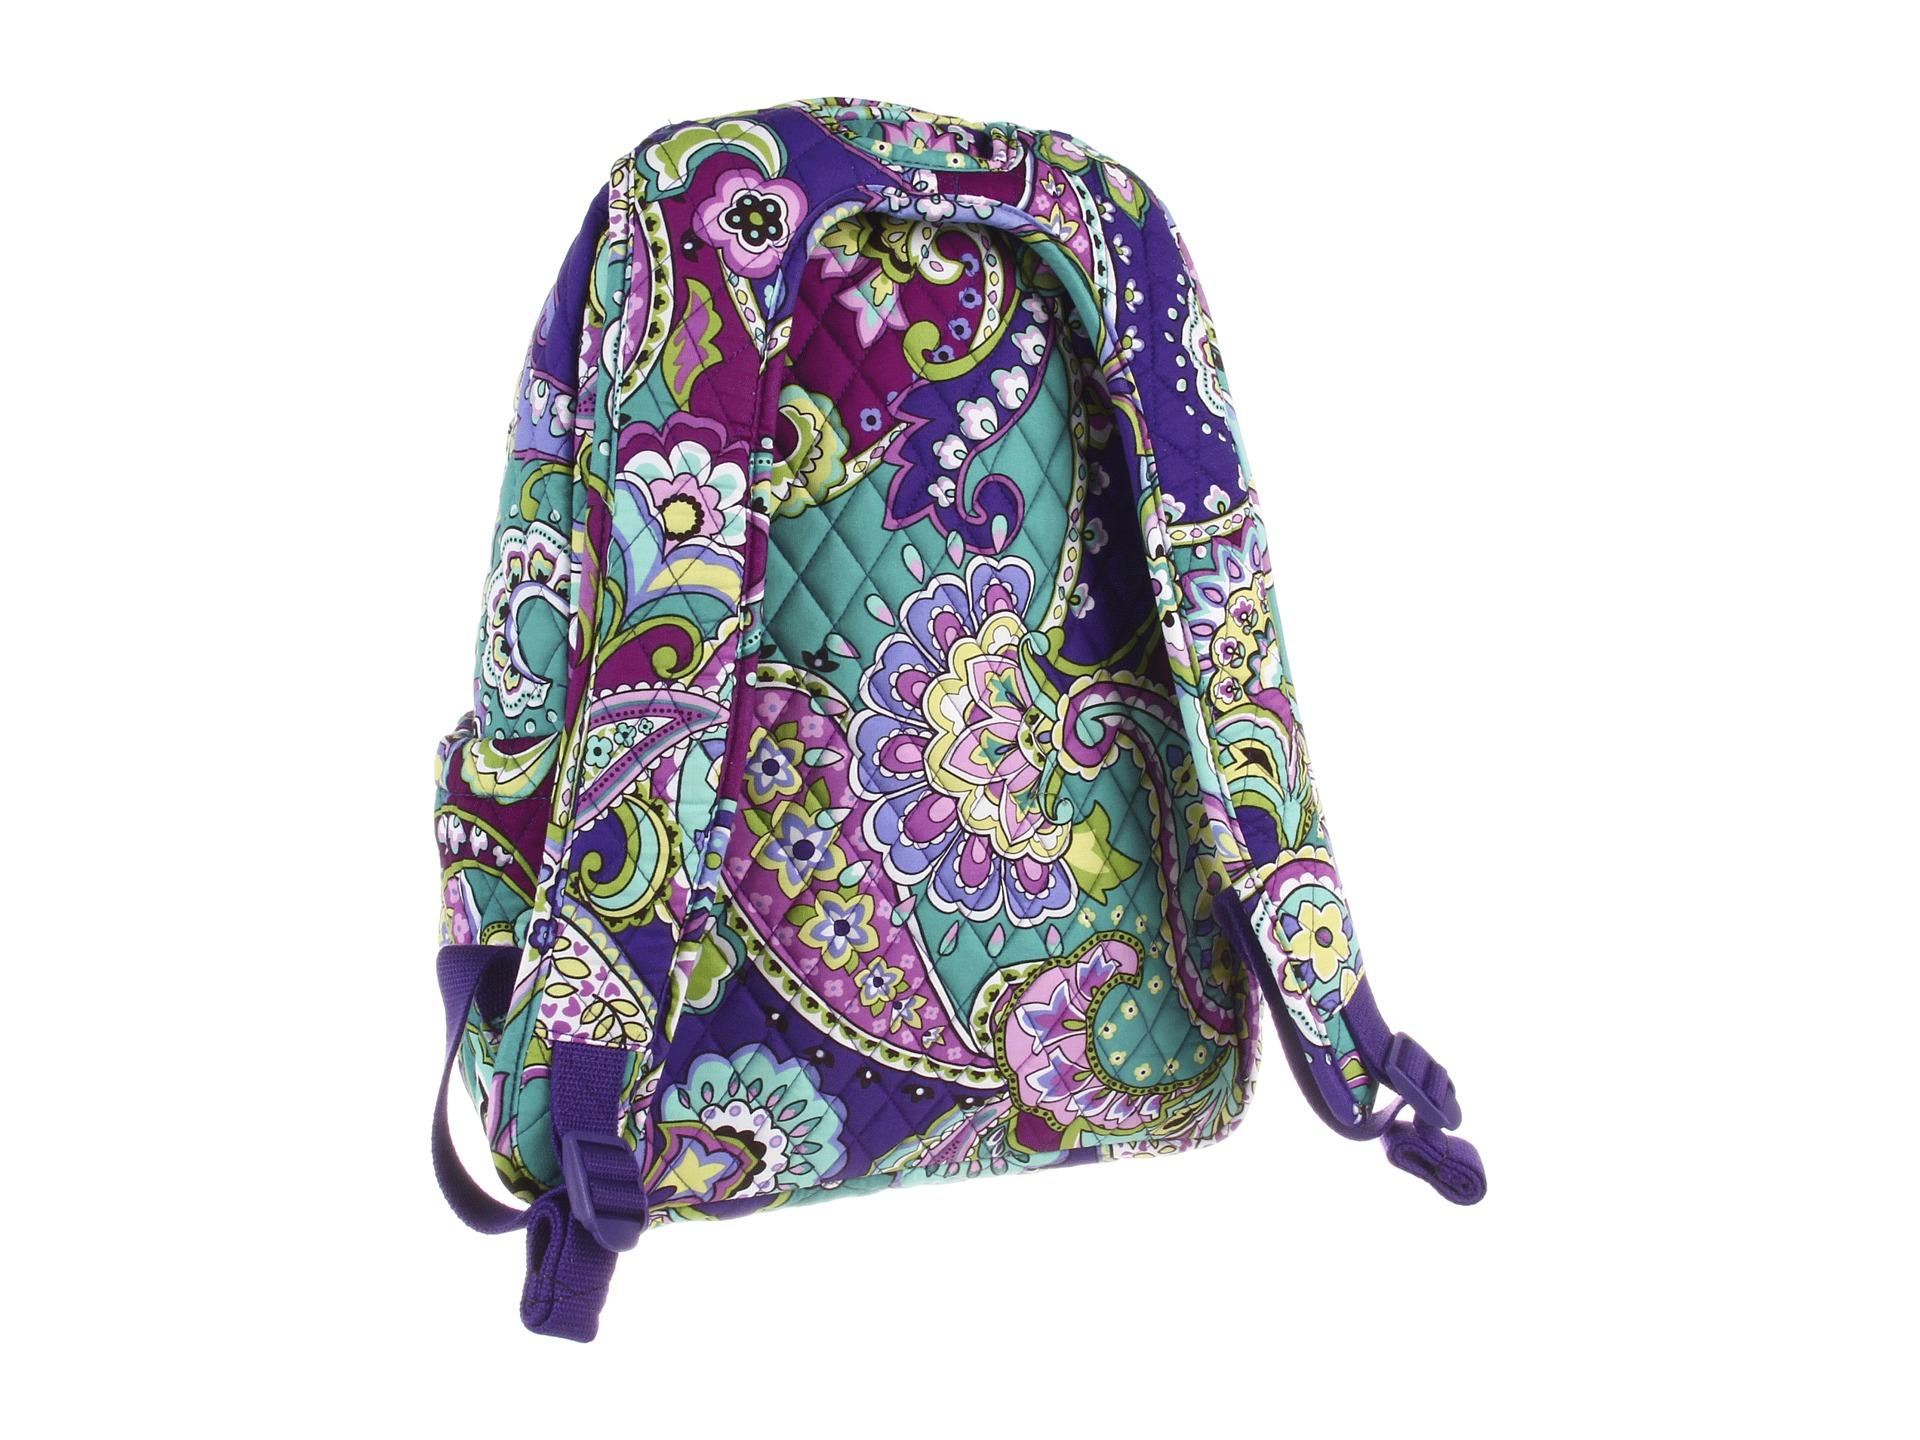 vera bradley backpack baby bag black shipped free at zappos. Black Bedroom Furniture Sets. Home Design Ideas